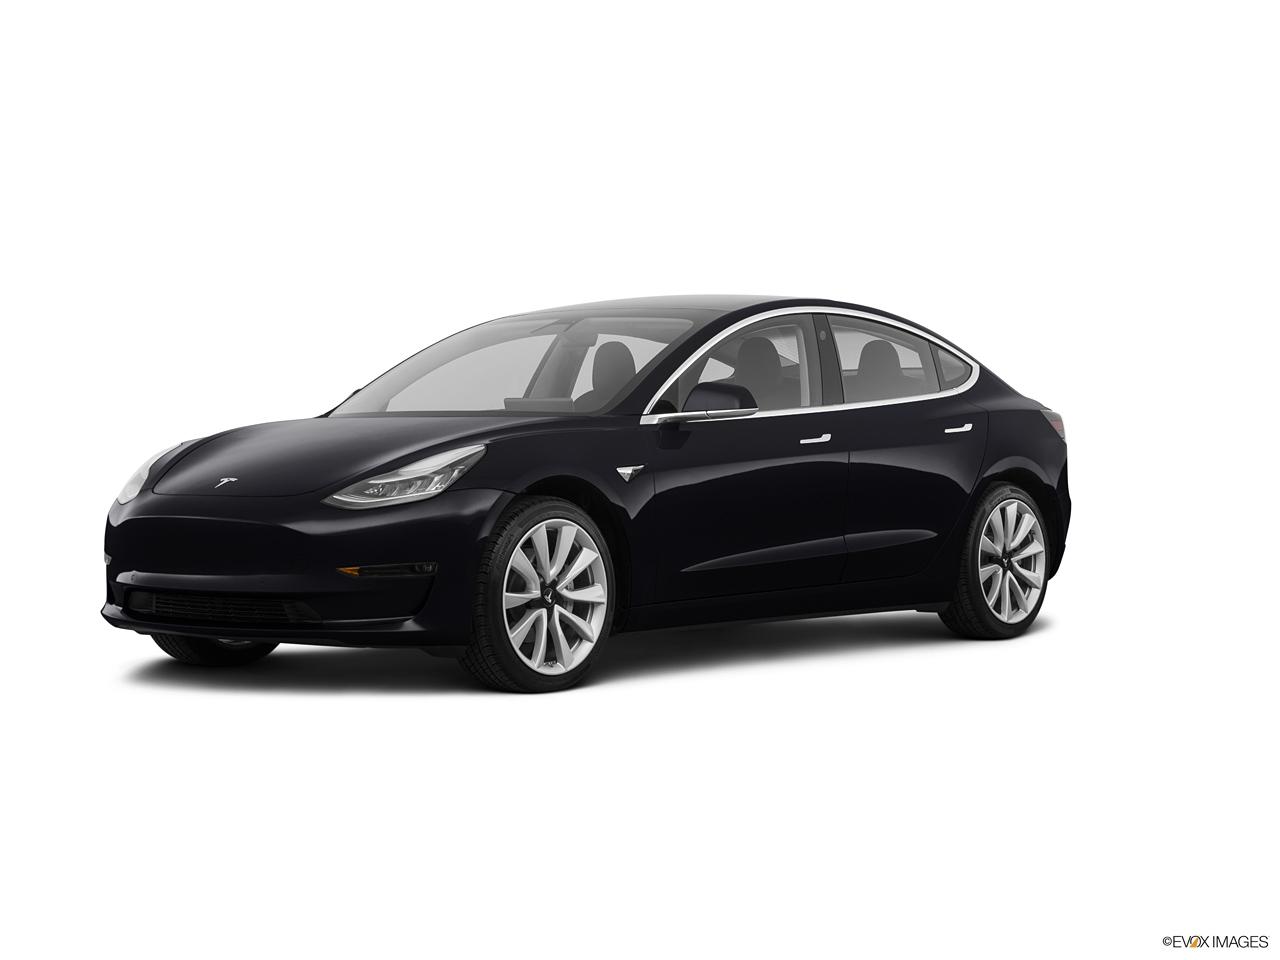 Tesla Lease Takeover >> Tesla Lease Takeover In Montreal Qc 2018 Tesla Model 3 Dual Motor Awd Long Range Automatic Awd Id 4335